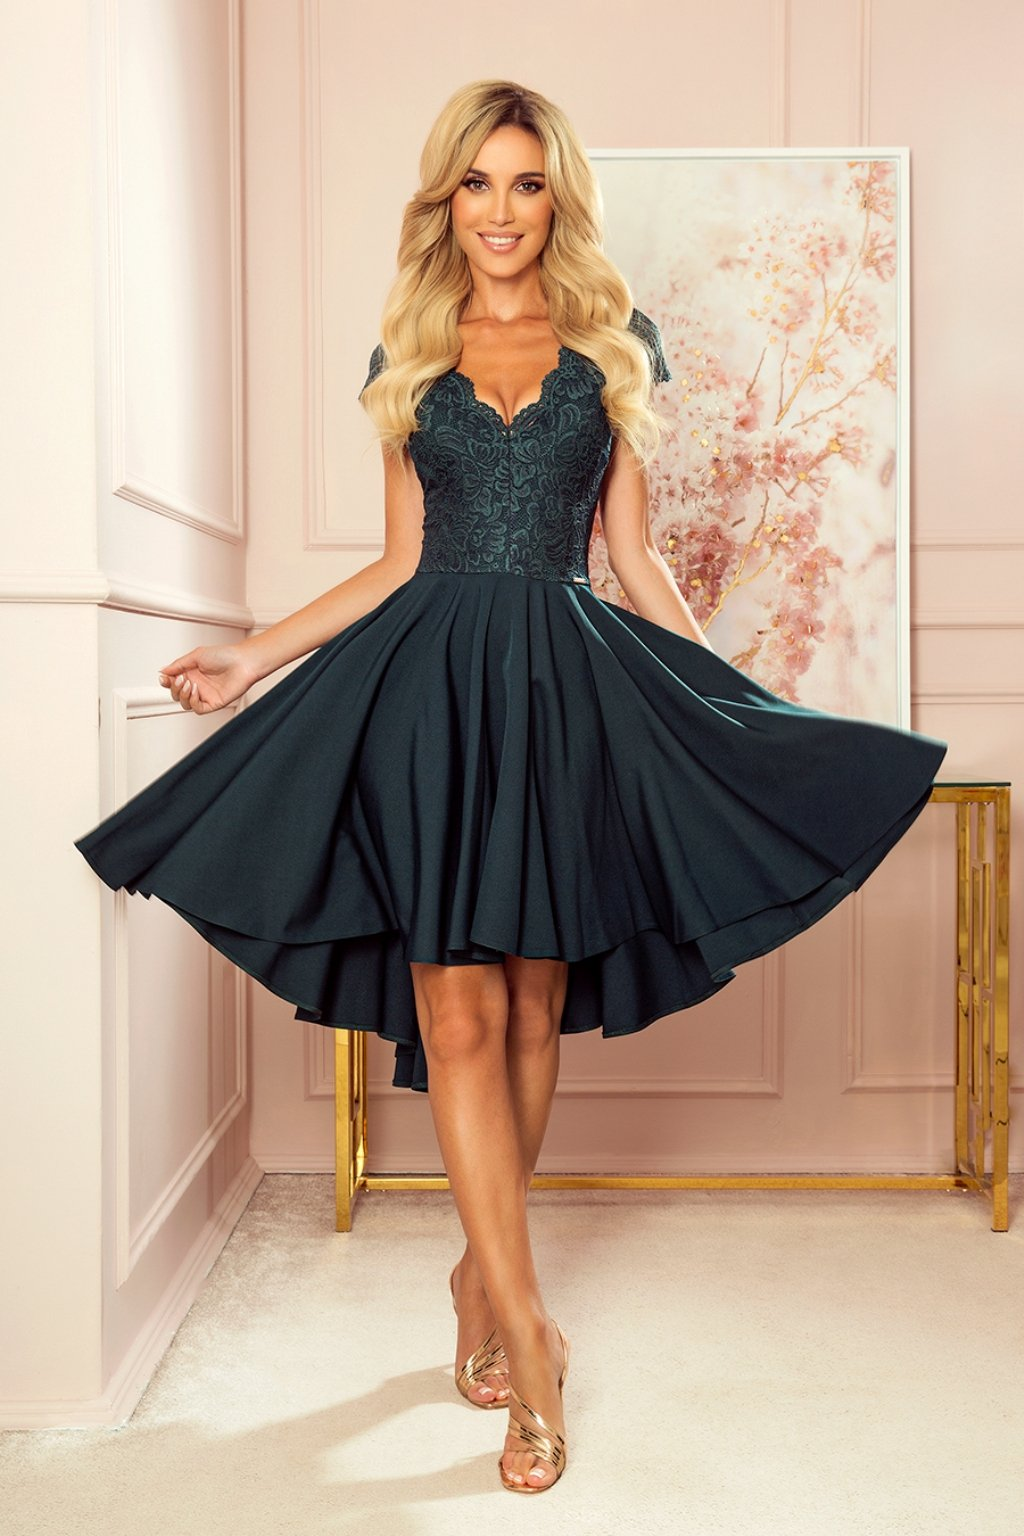 Tmavozelené asymetrické šaty s čipkou a krátkymi rukávmi